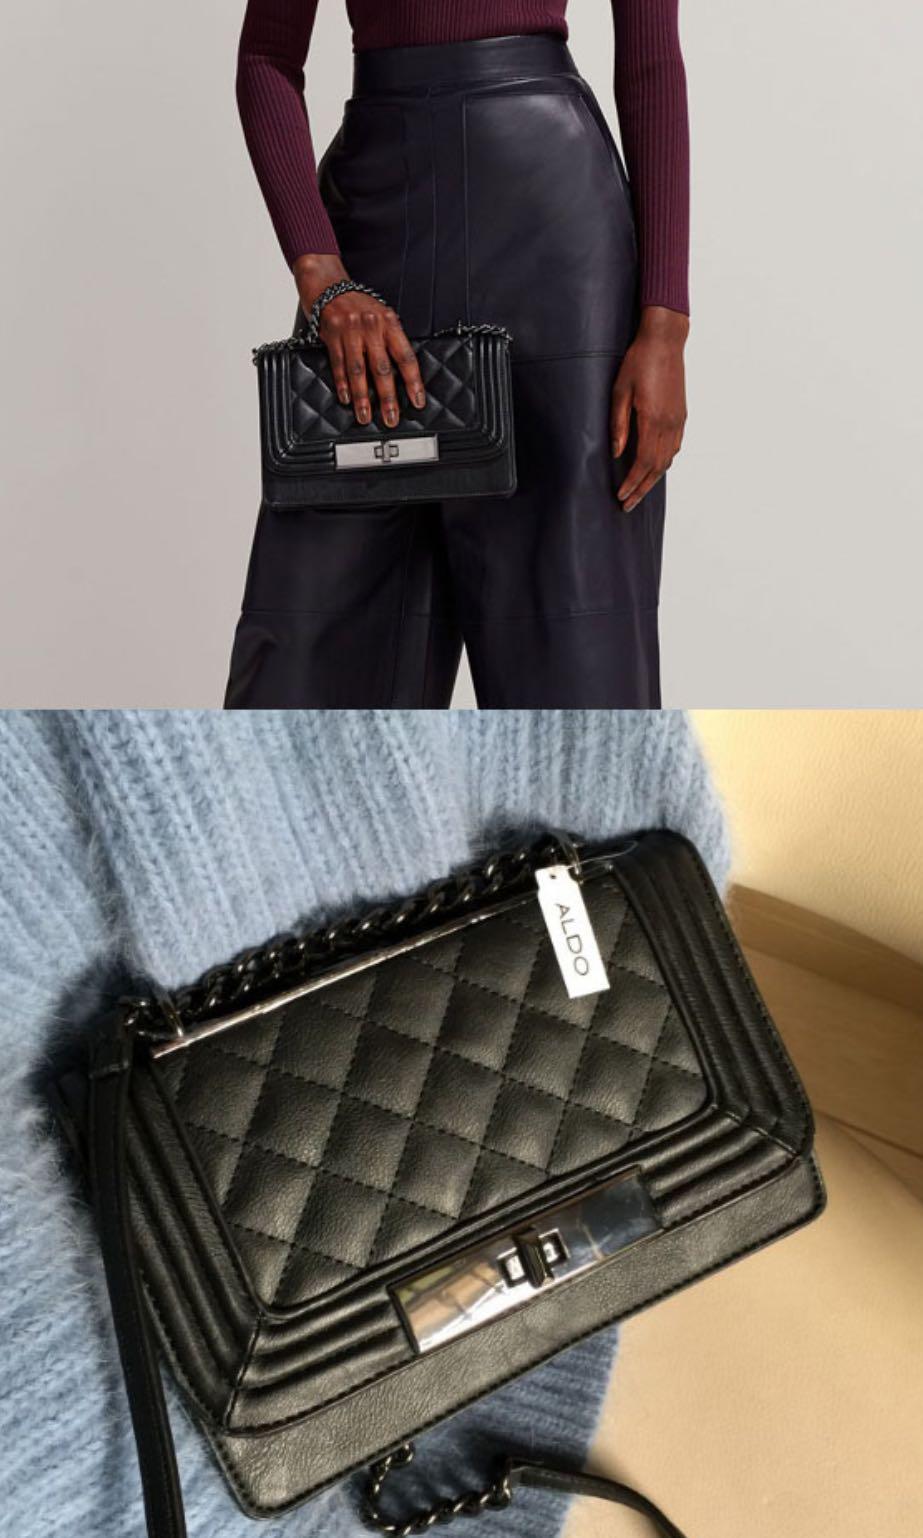 376d6d1dce5 💃🏽💃🏽💃🏽BEST DEAL! ALDO DEROGALI CROSS BODY BAG (BLACK) READY ...